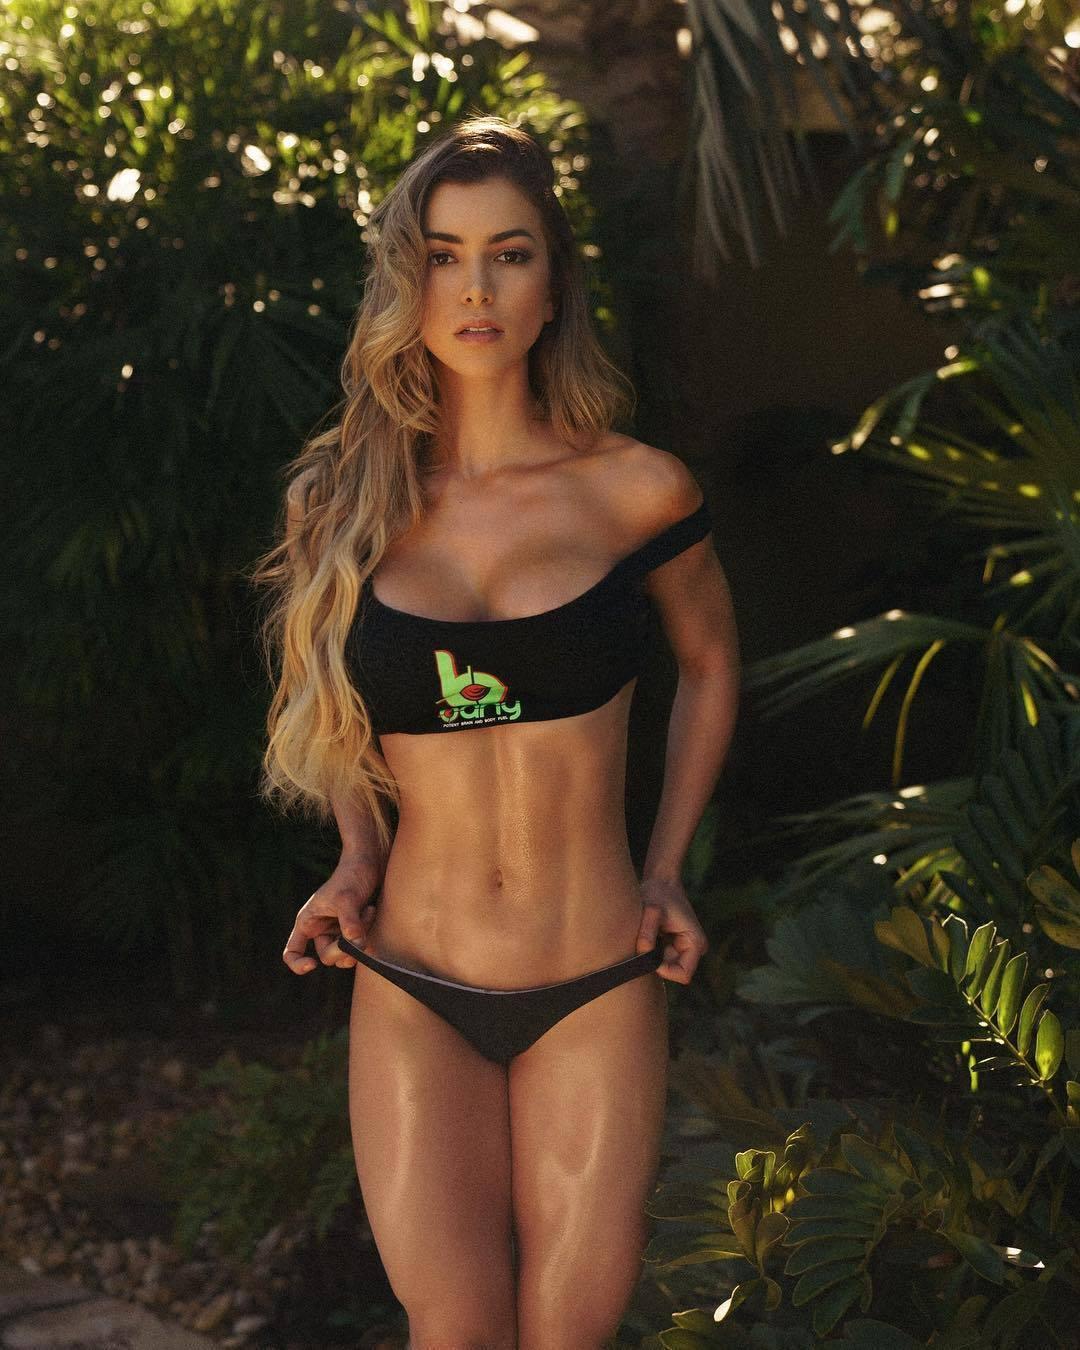 Hot Anllela Sagra naked (93 foto and video), Tits, Paparazzi, Feet, underwear 2019